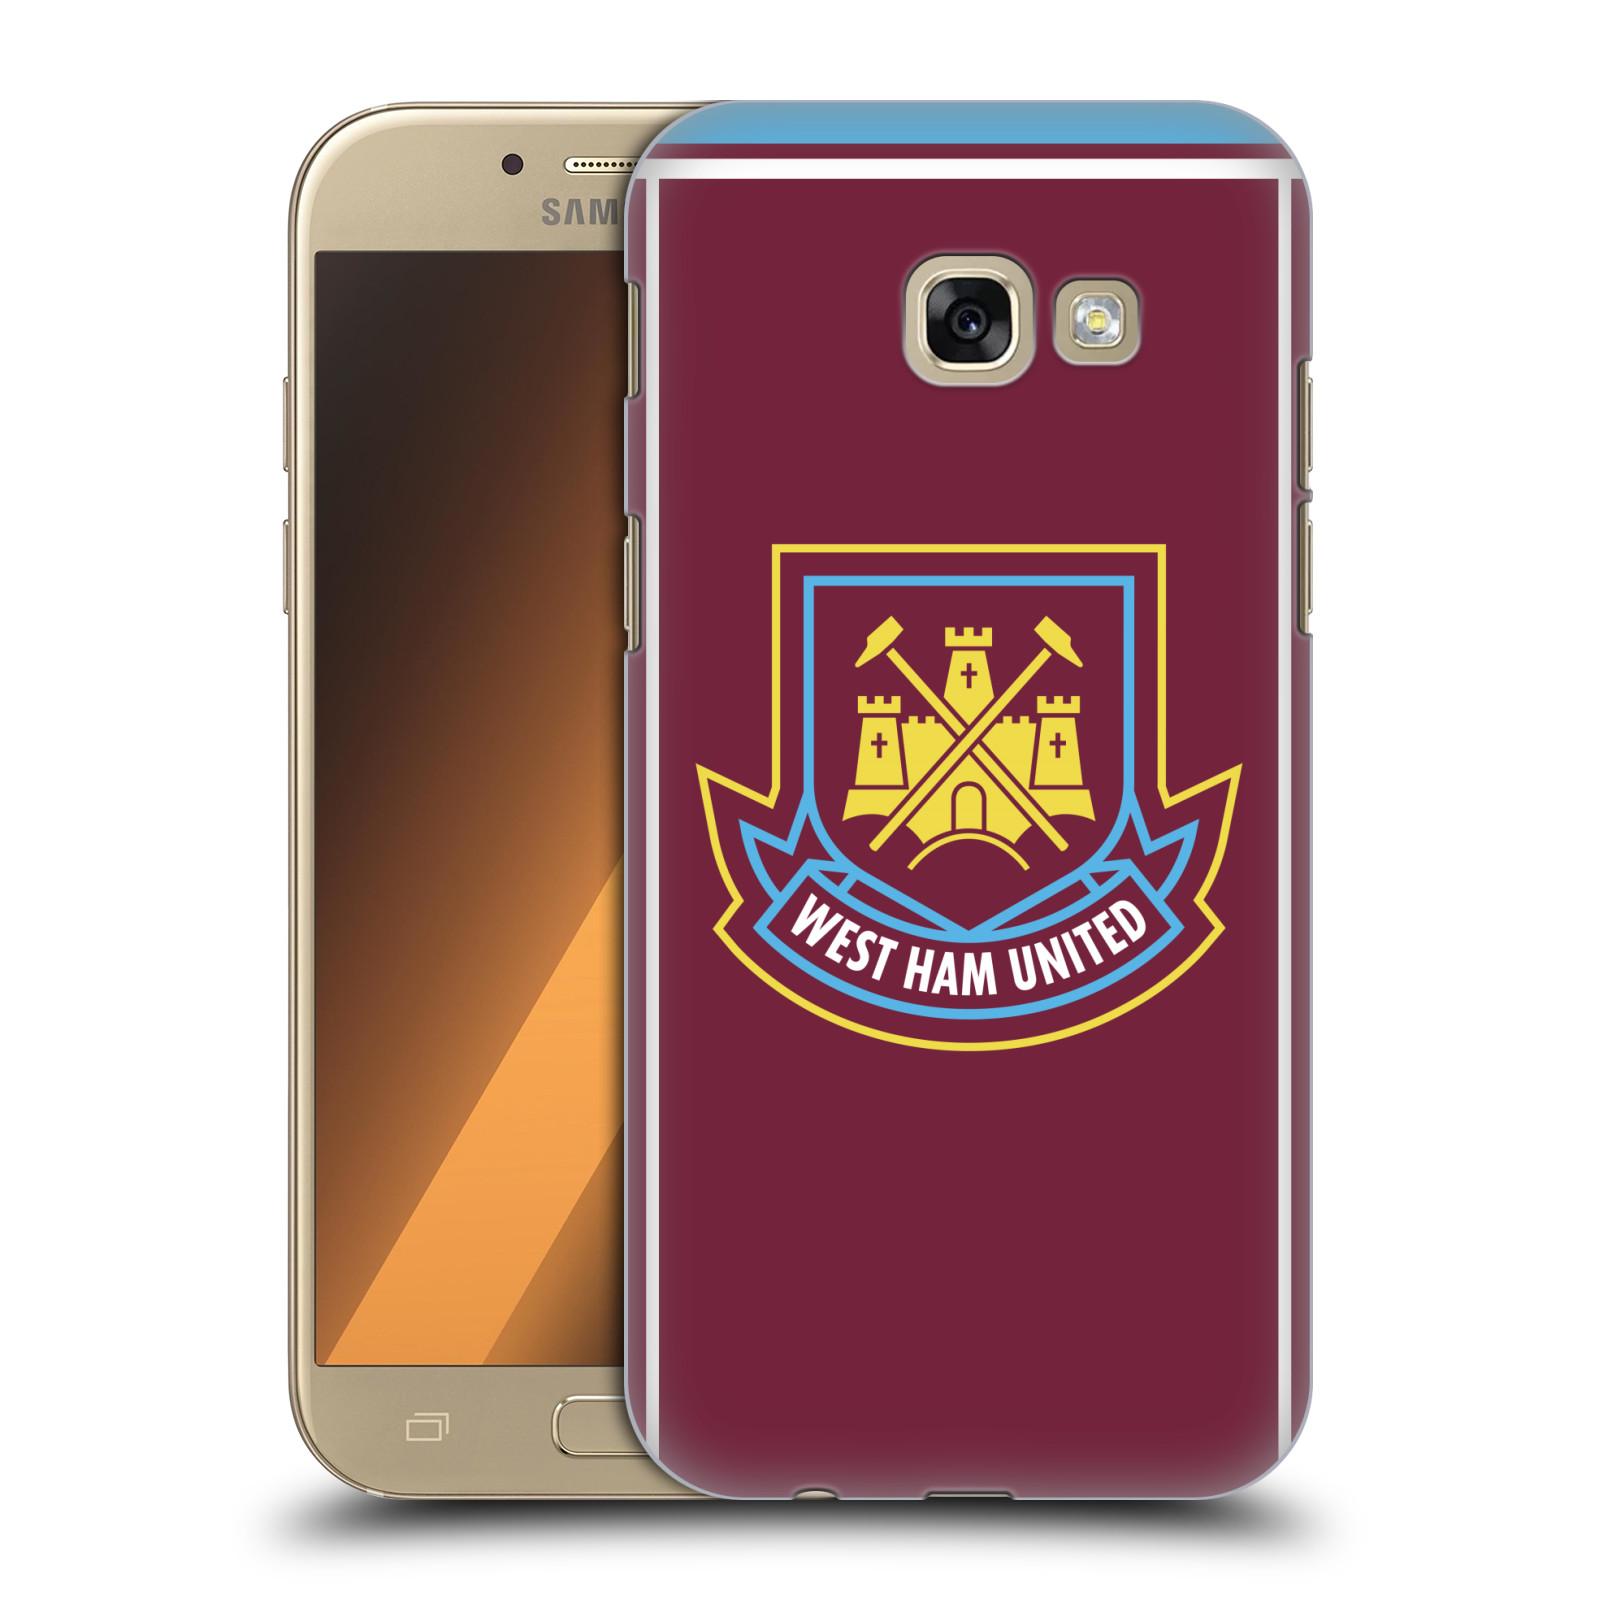 Plastové pouzdro na mobil Samsung Galaxy A5 (2017) - Head Case - West Ham United - Retro znak